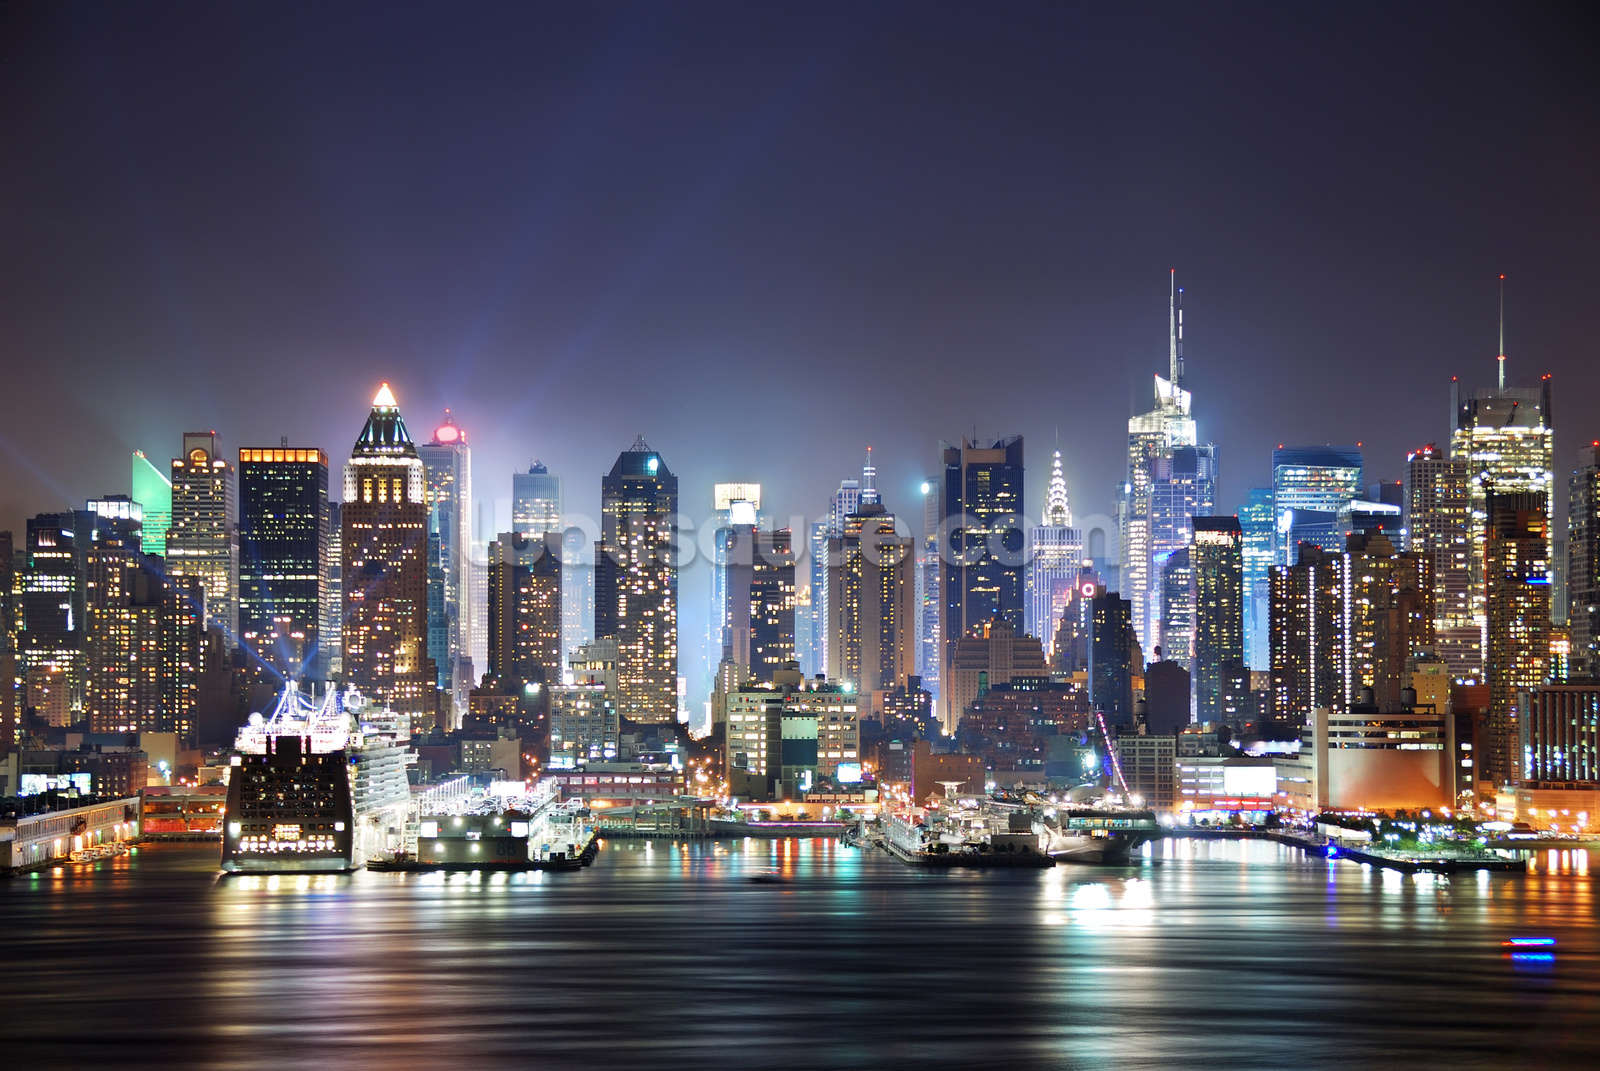 New York Manhattan Skyline At Night Wallpaper Wall Mural ... Part 51